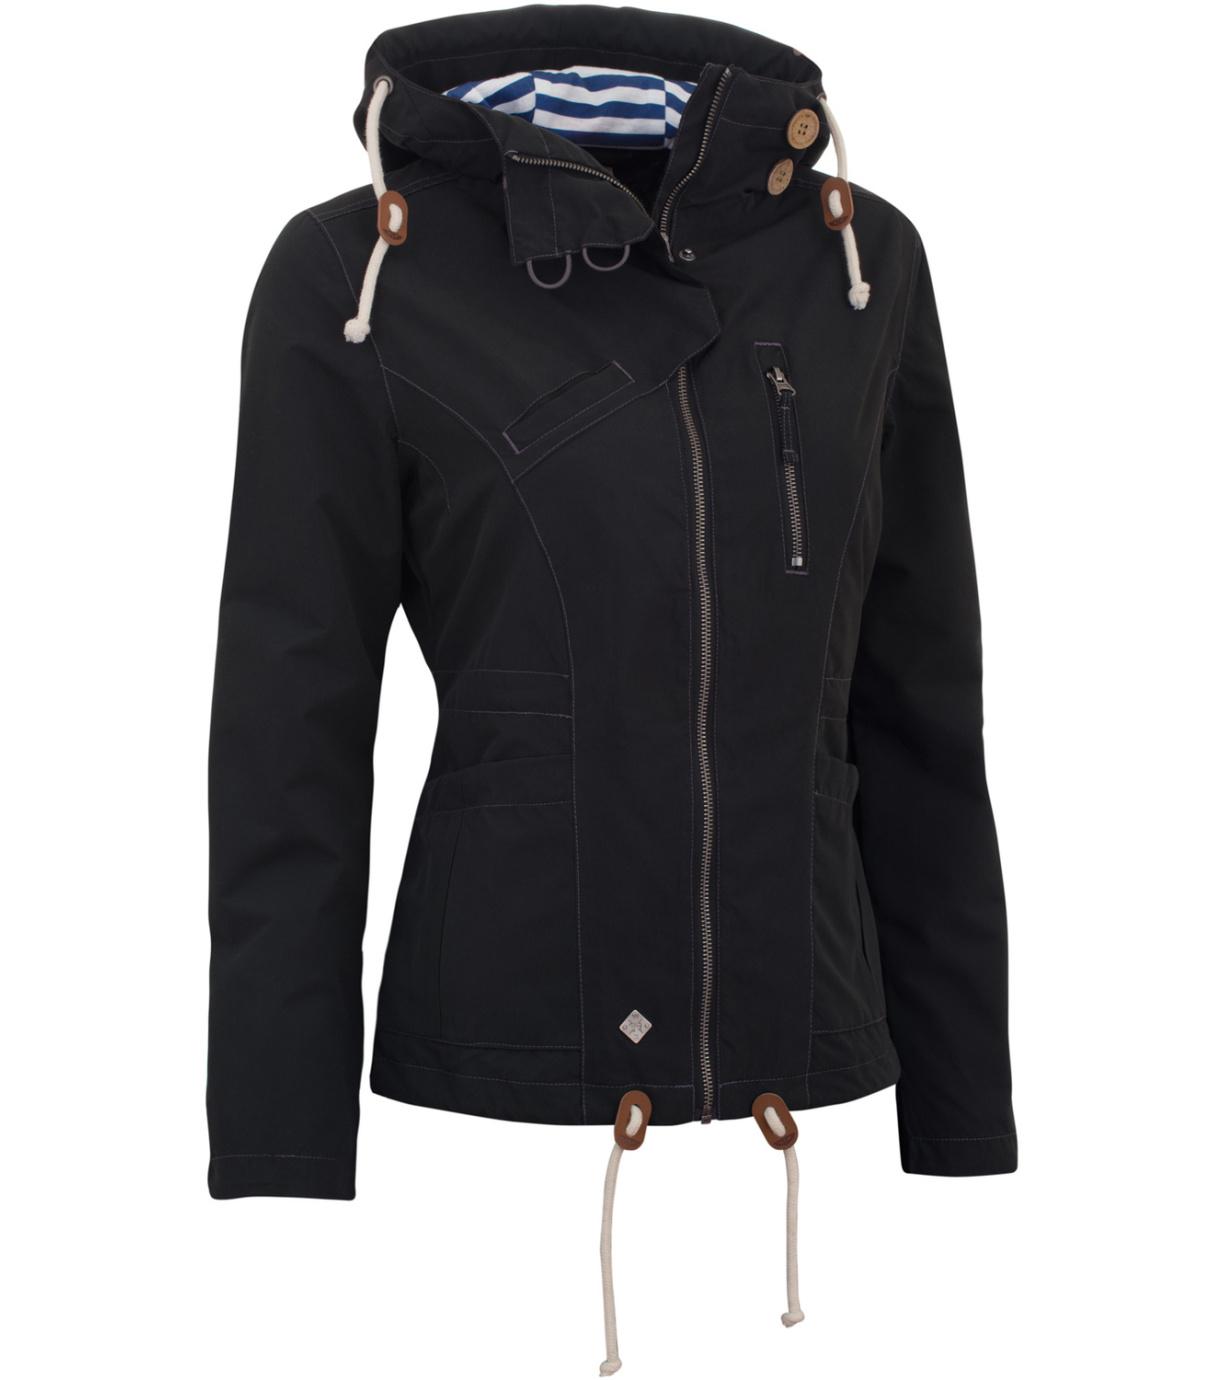 WOOX Větrovka Drizzle Jacket Ladies´ Dark wx1614105 34